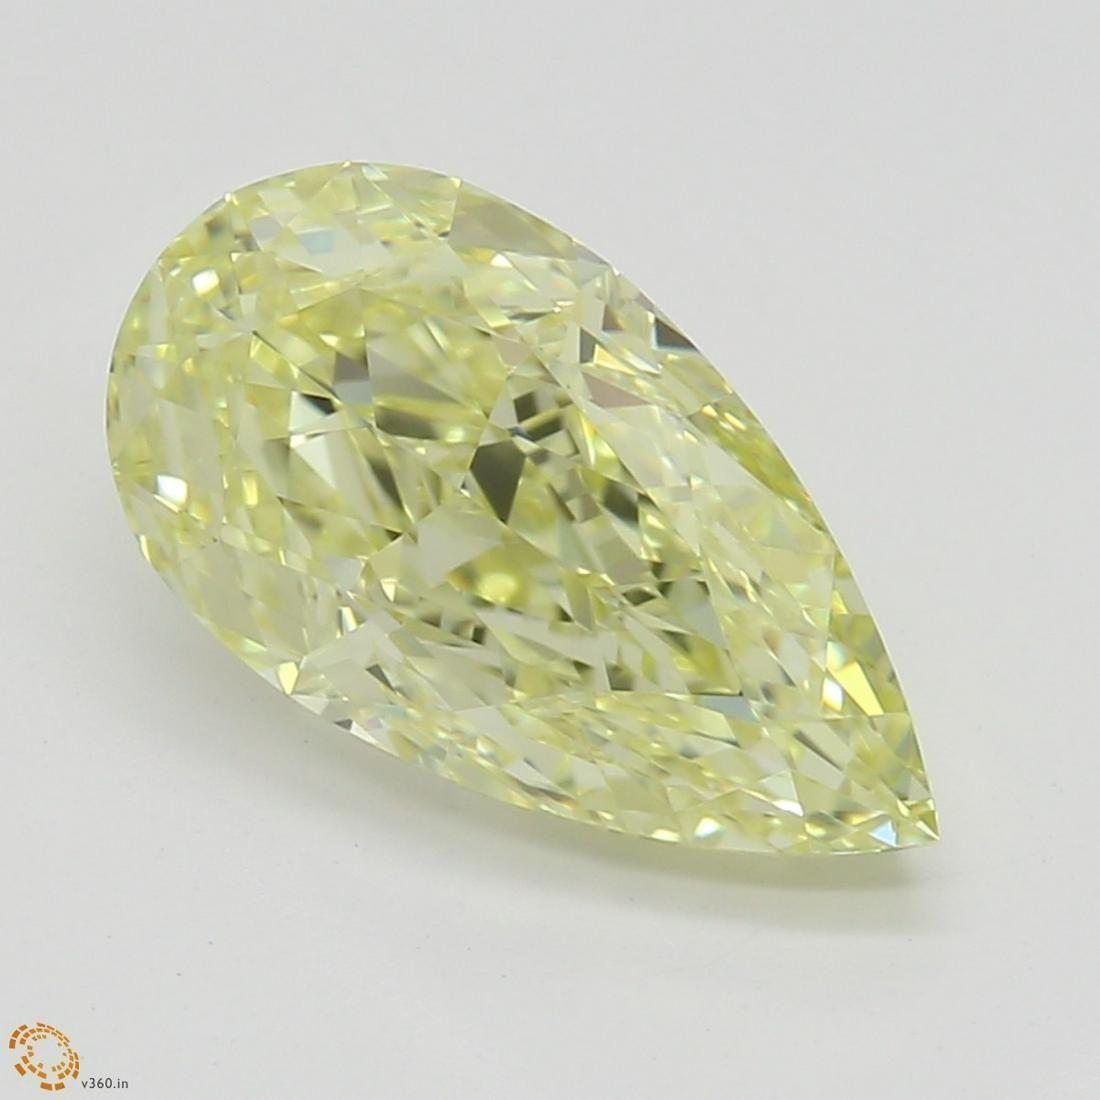 1.51 ct, Yellow/VVS1, Pear cut GIA Graded Diamond